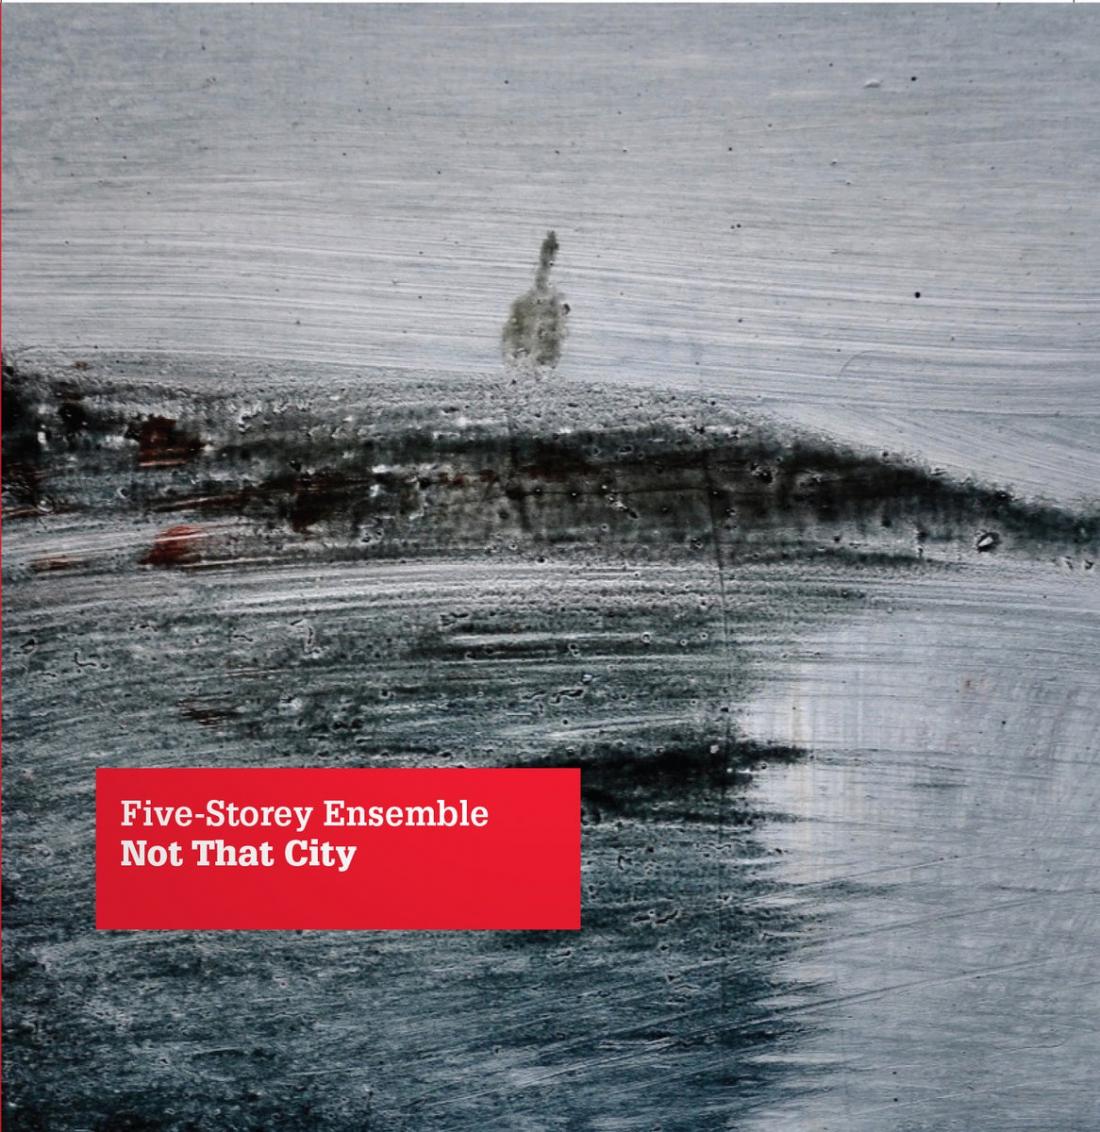 netherland dwarf のコラム『rabbit on the run』 第24回  FIVE-STOREY ENSEMBLE / Not That City (Belarus / 2013)